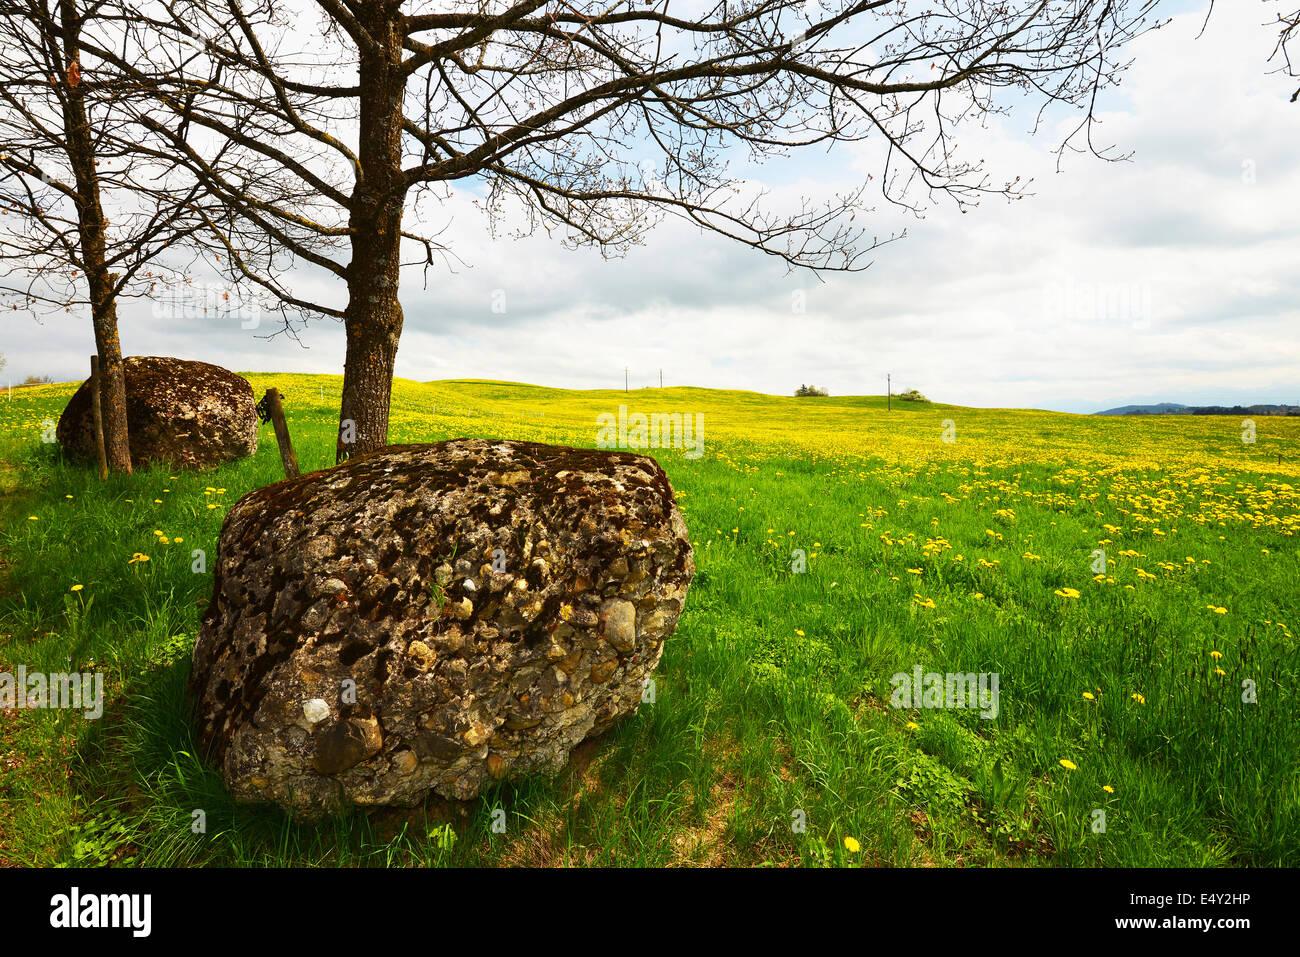 boulder on alp meadow - Stock Image